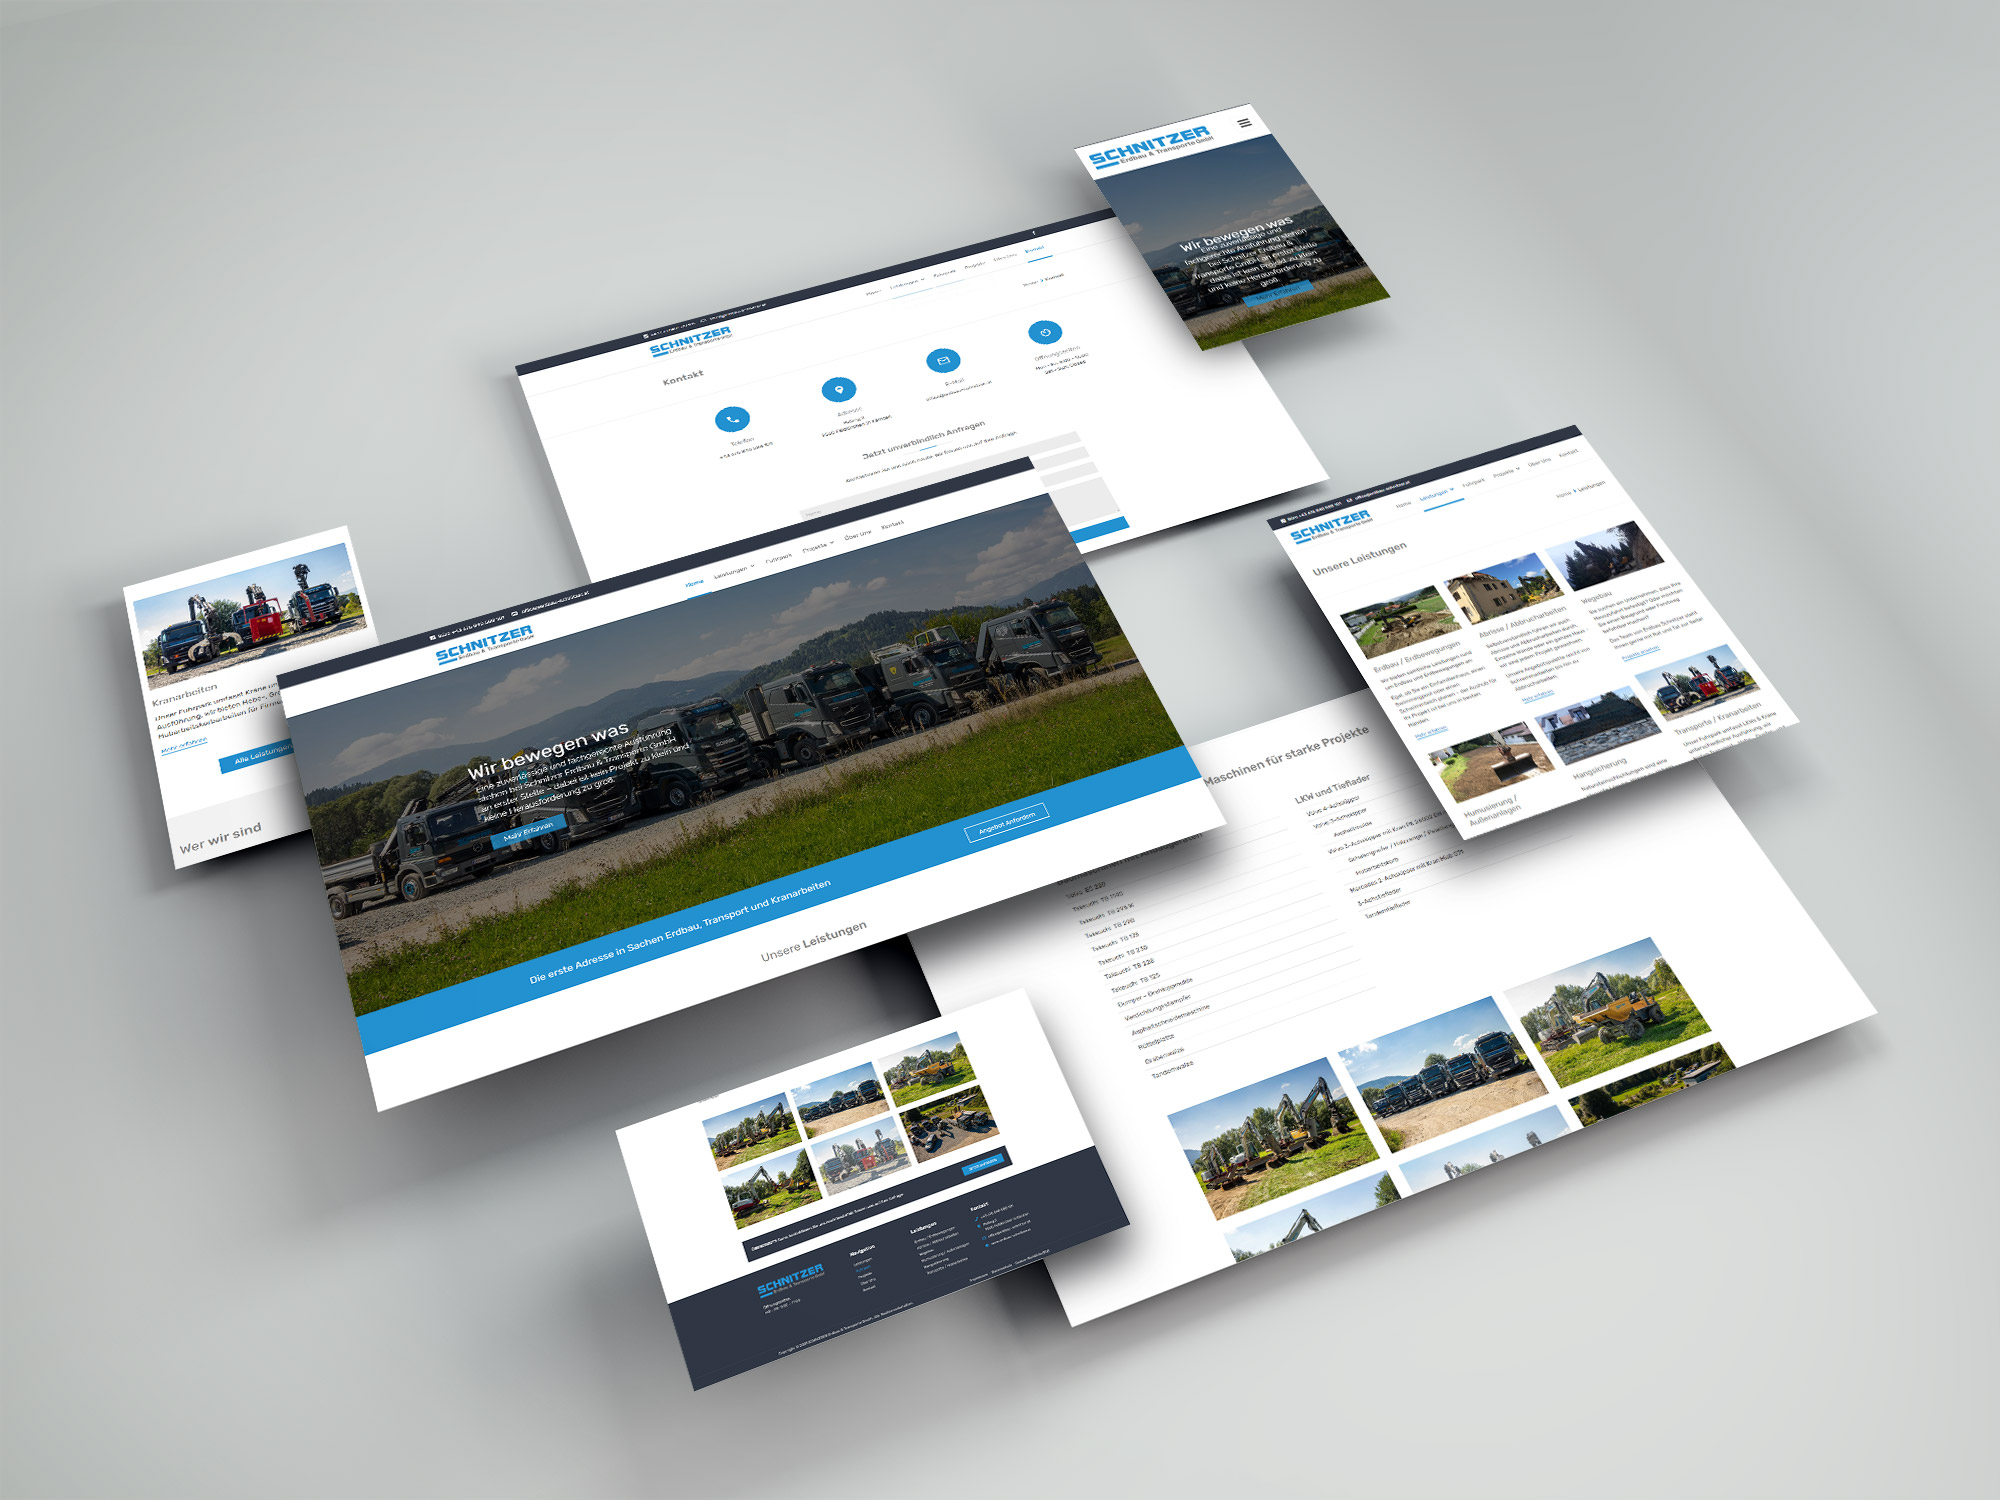 erdbau-schnitzer-screen-mockup-small